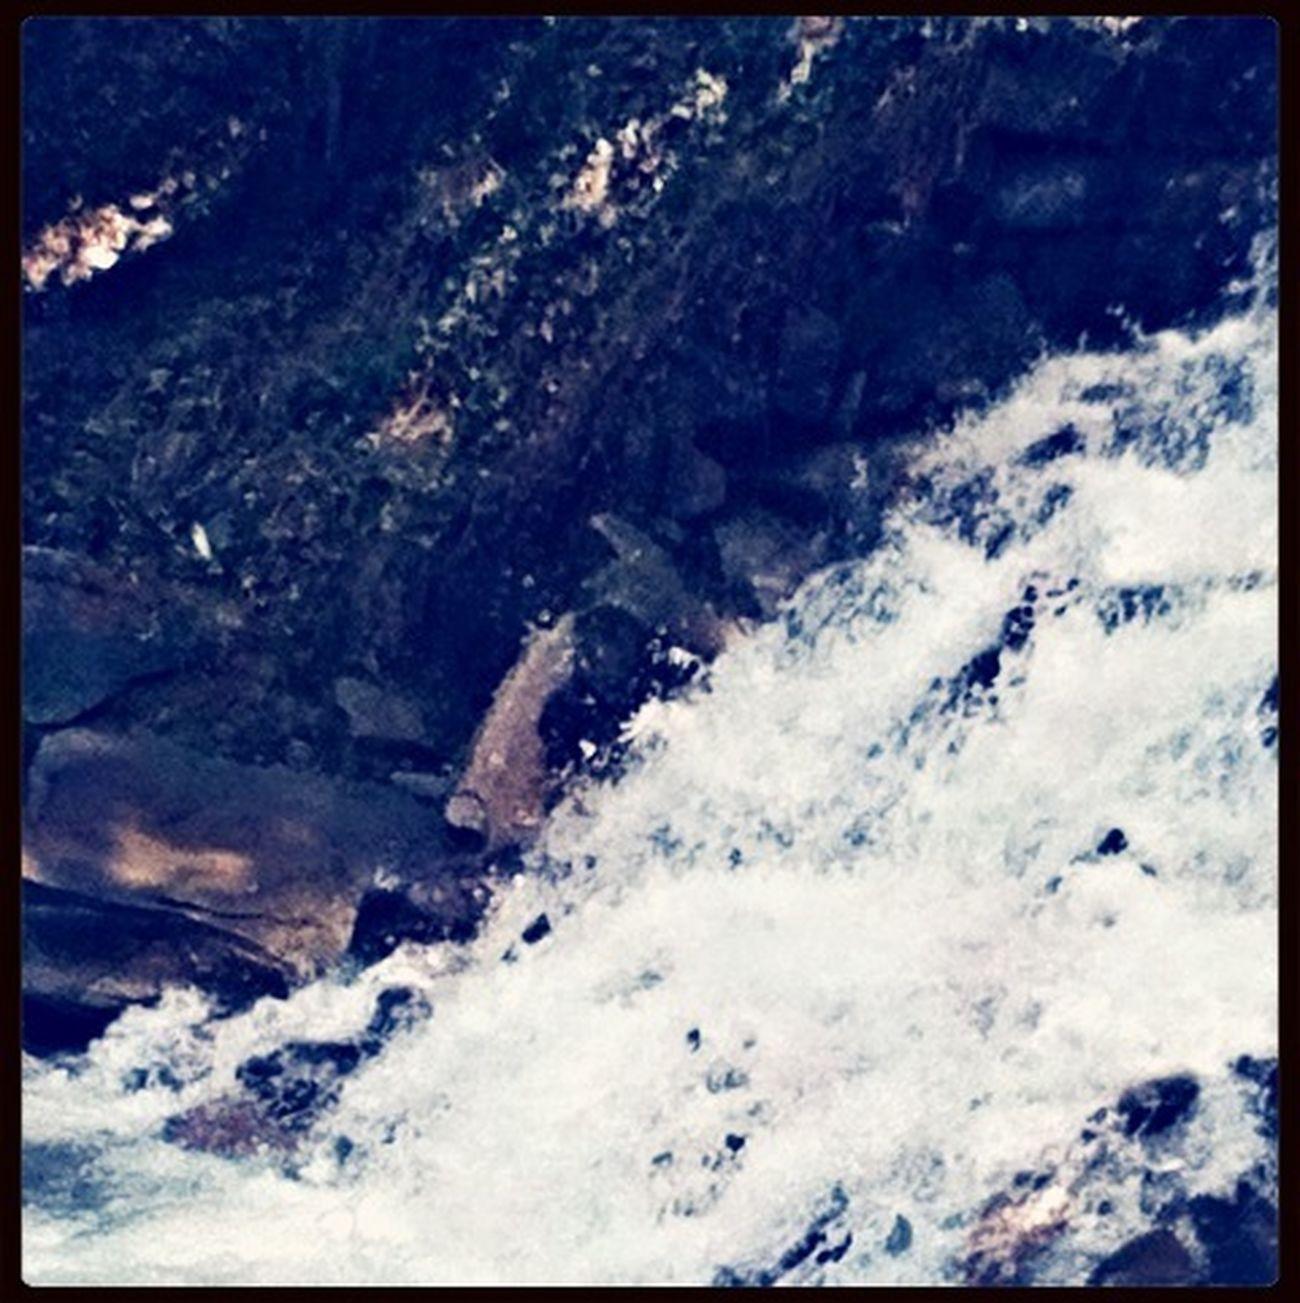 Waterfalls, @ Pennsylvania Instant Photo Op Beauty Nature Popular Photos